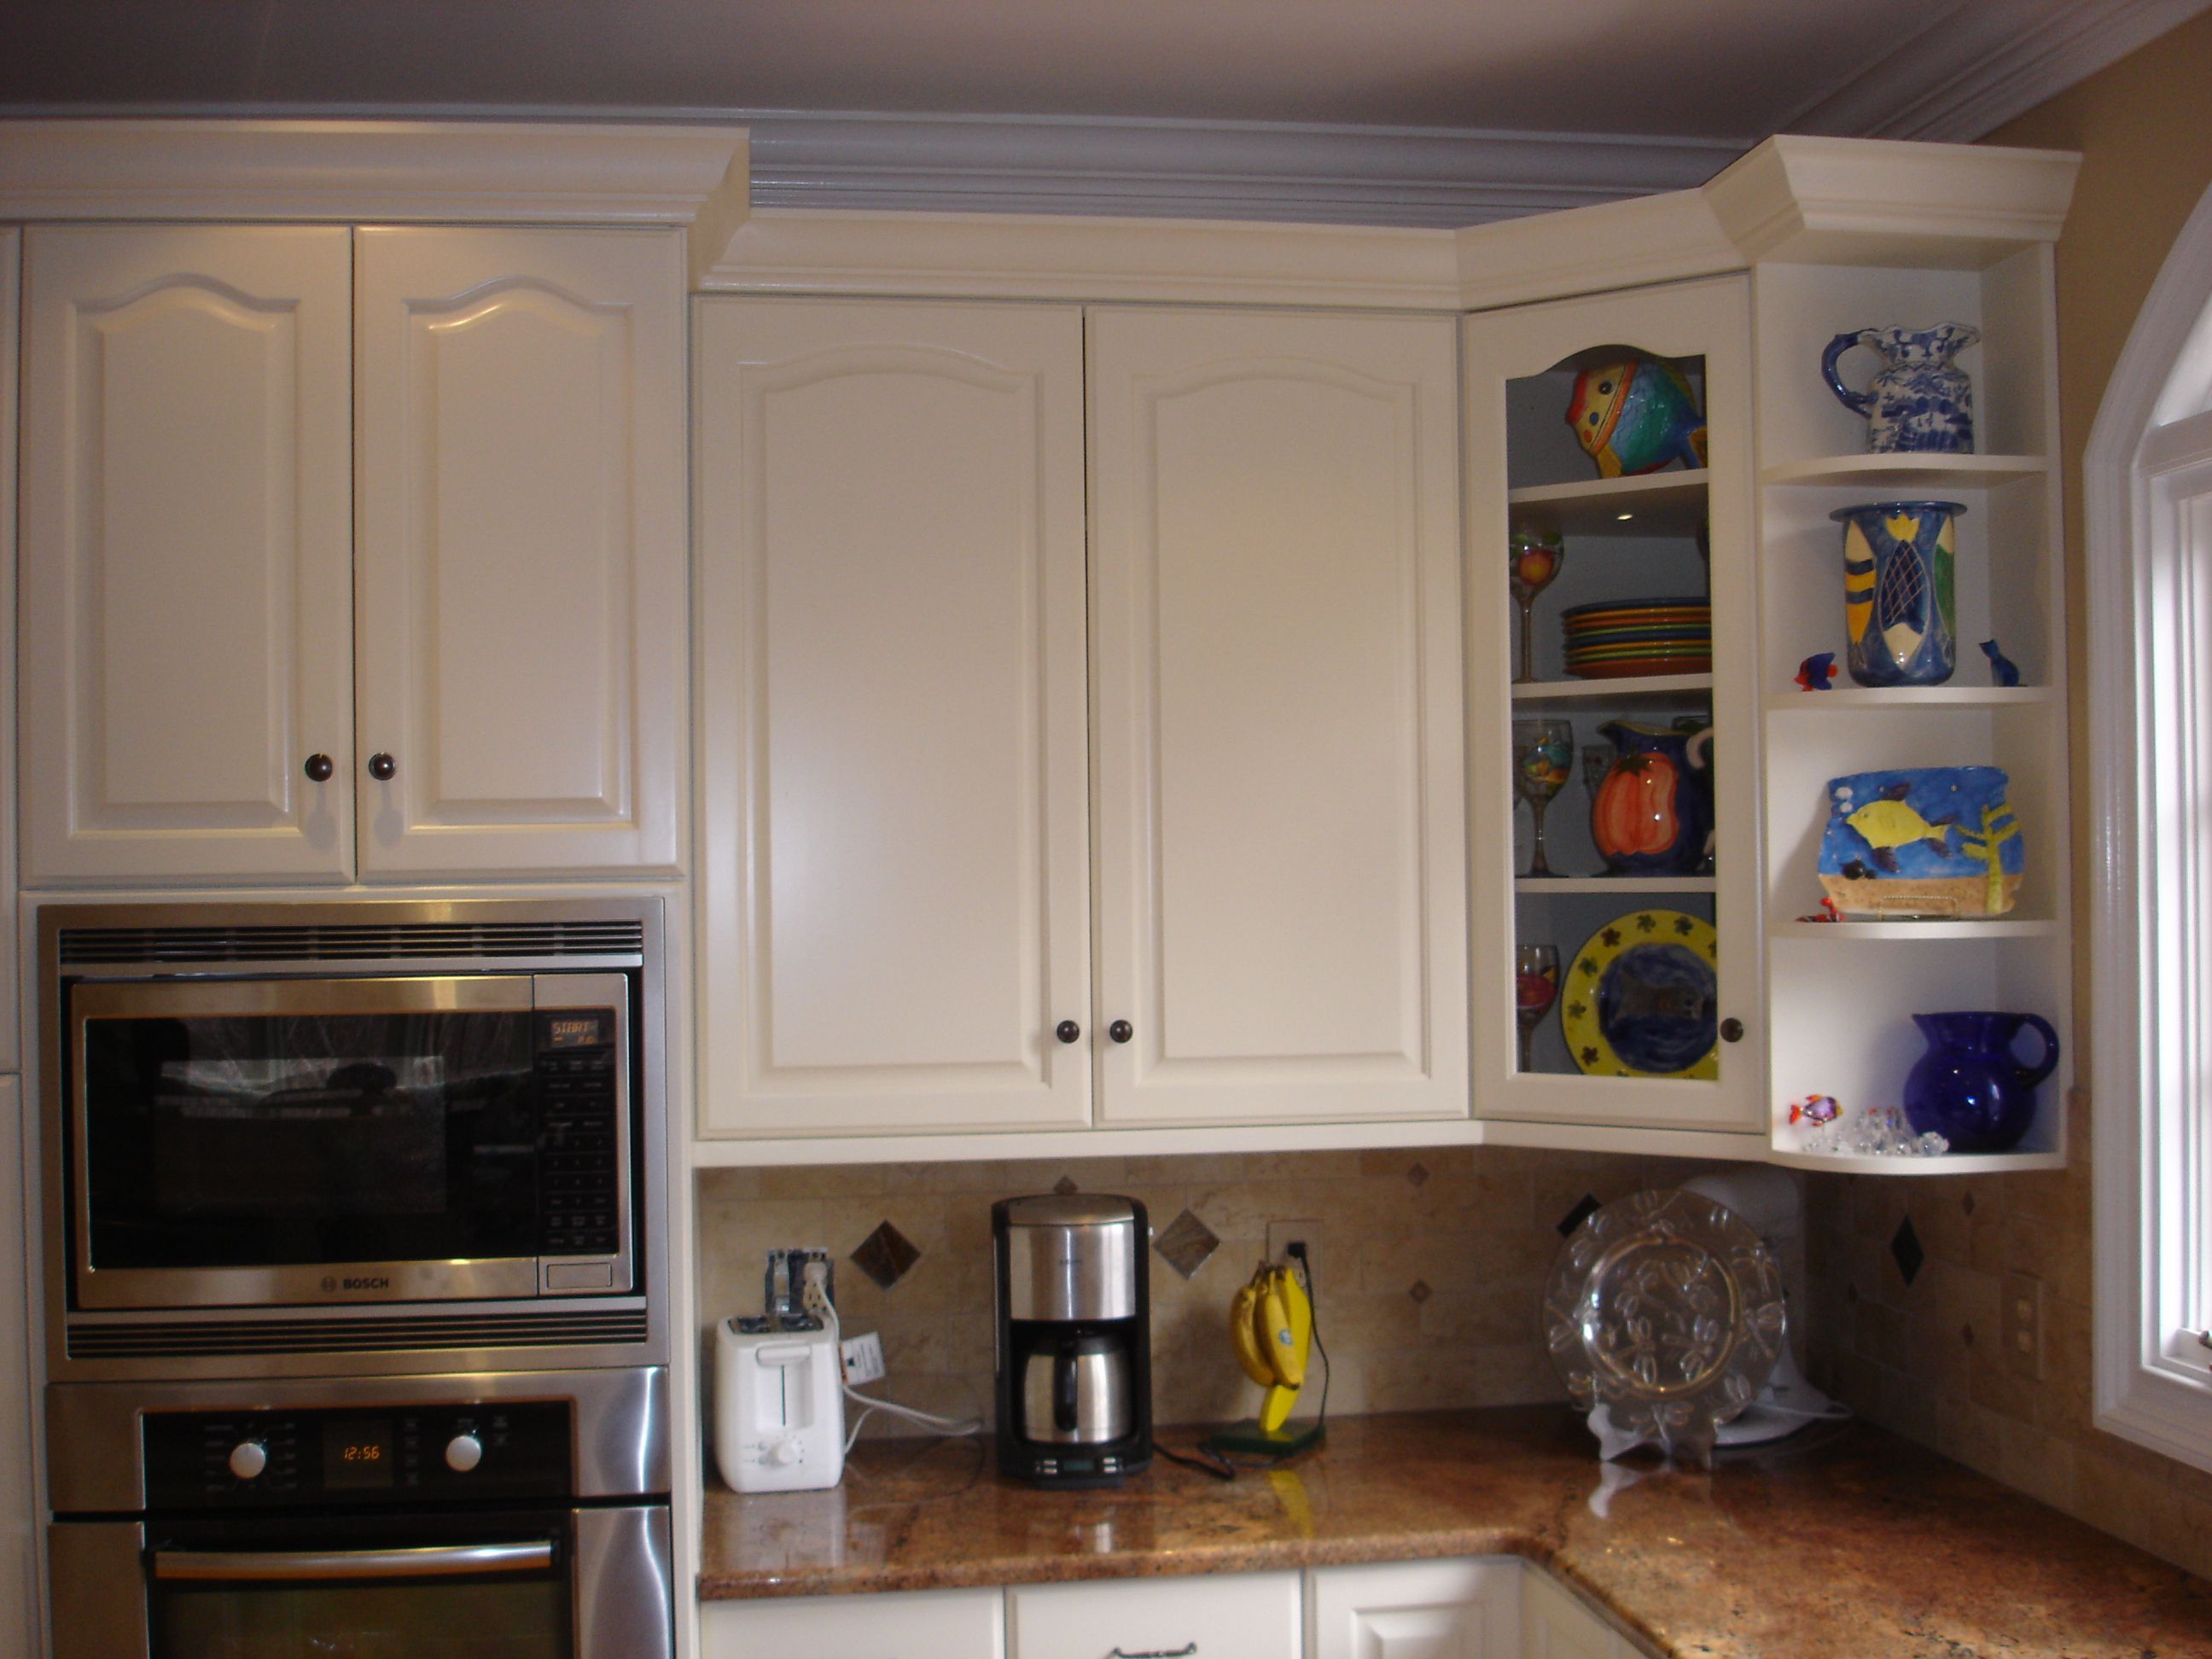 Pin By Sara Leavitt On Remodel Corner Kitchen Cabinet Glass Kitchen Cabinet Doors Glass Cabinet Doors